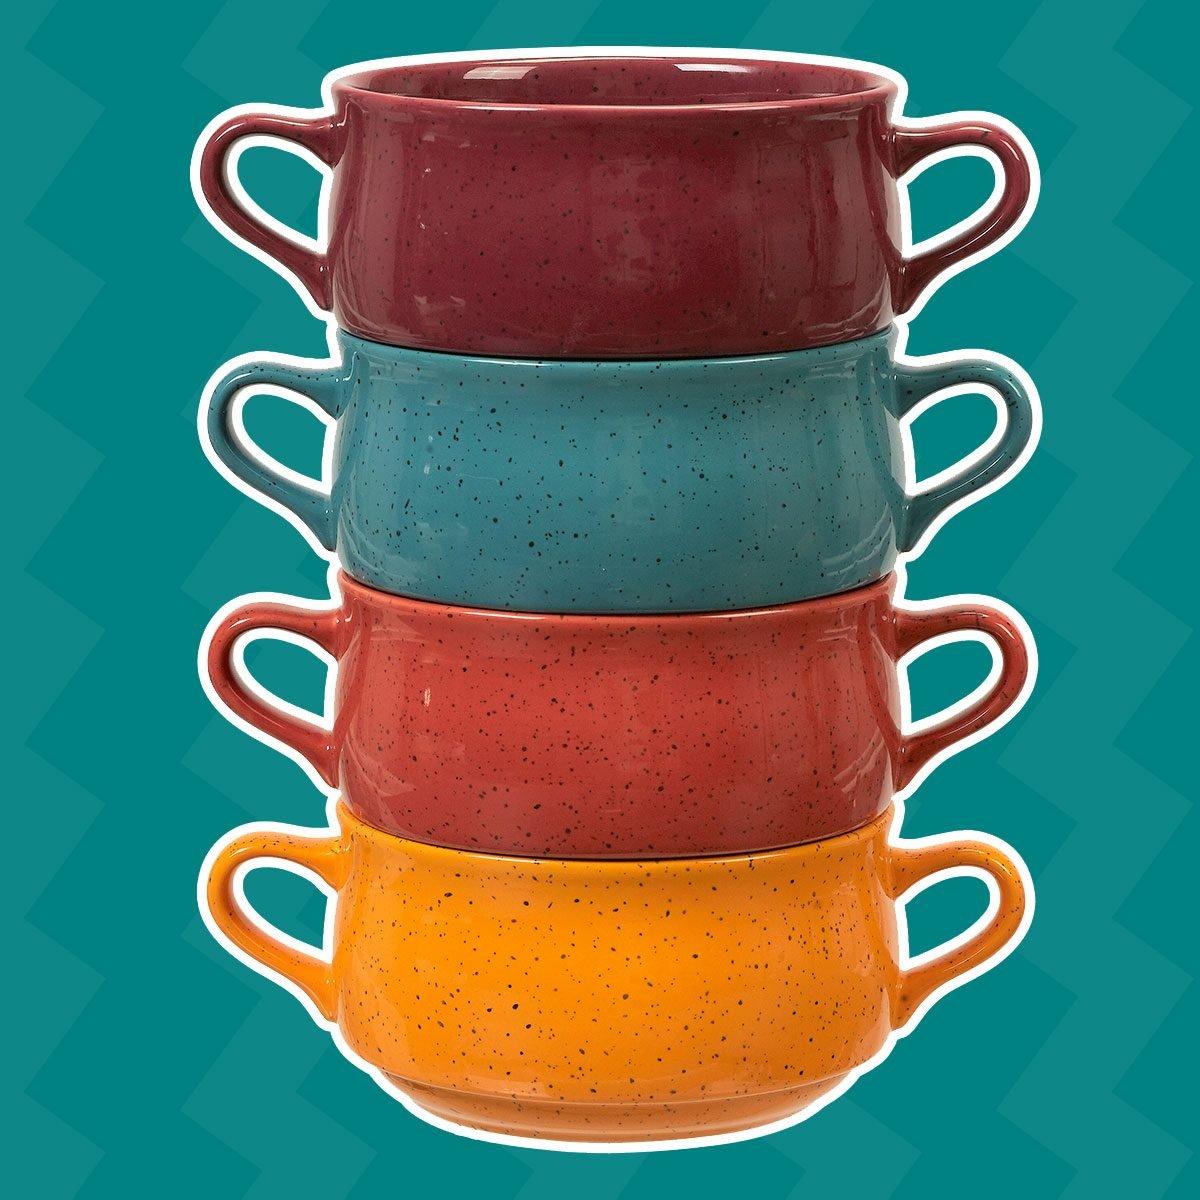 Mainstays Multi-Color Speckled Stoneware Double Handle Soup Bowls, Set of 4